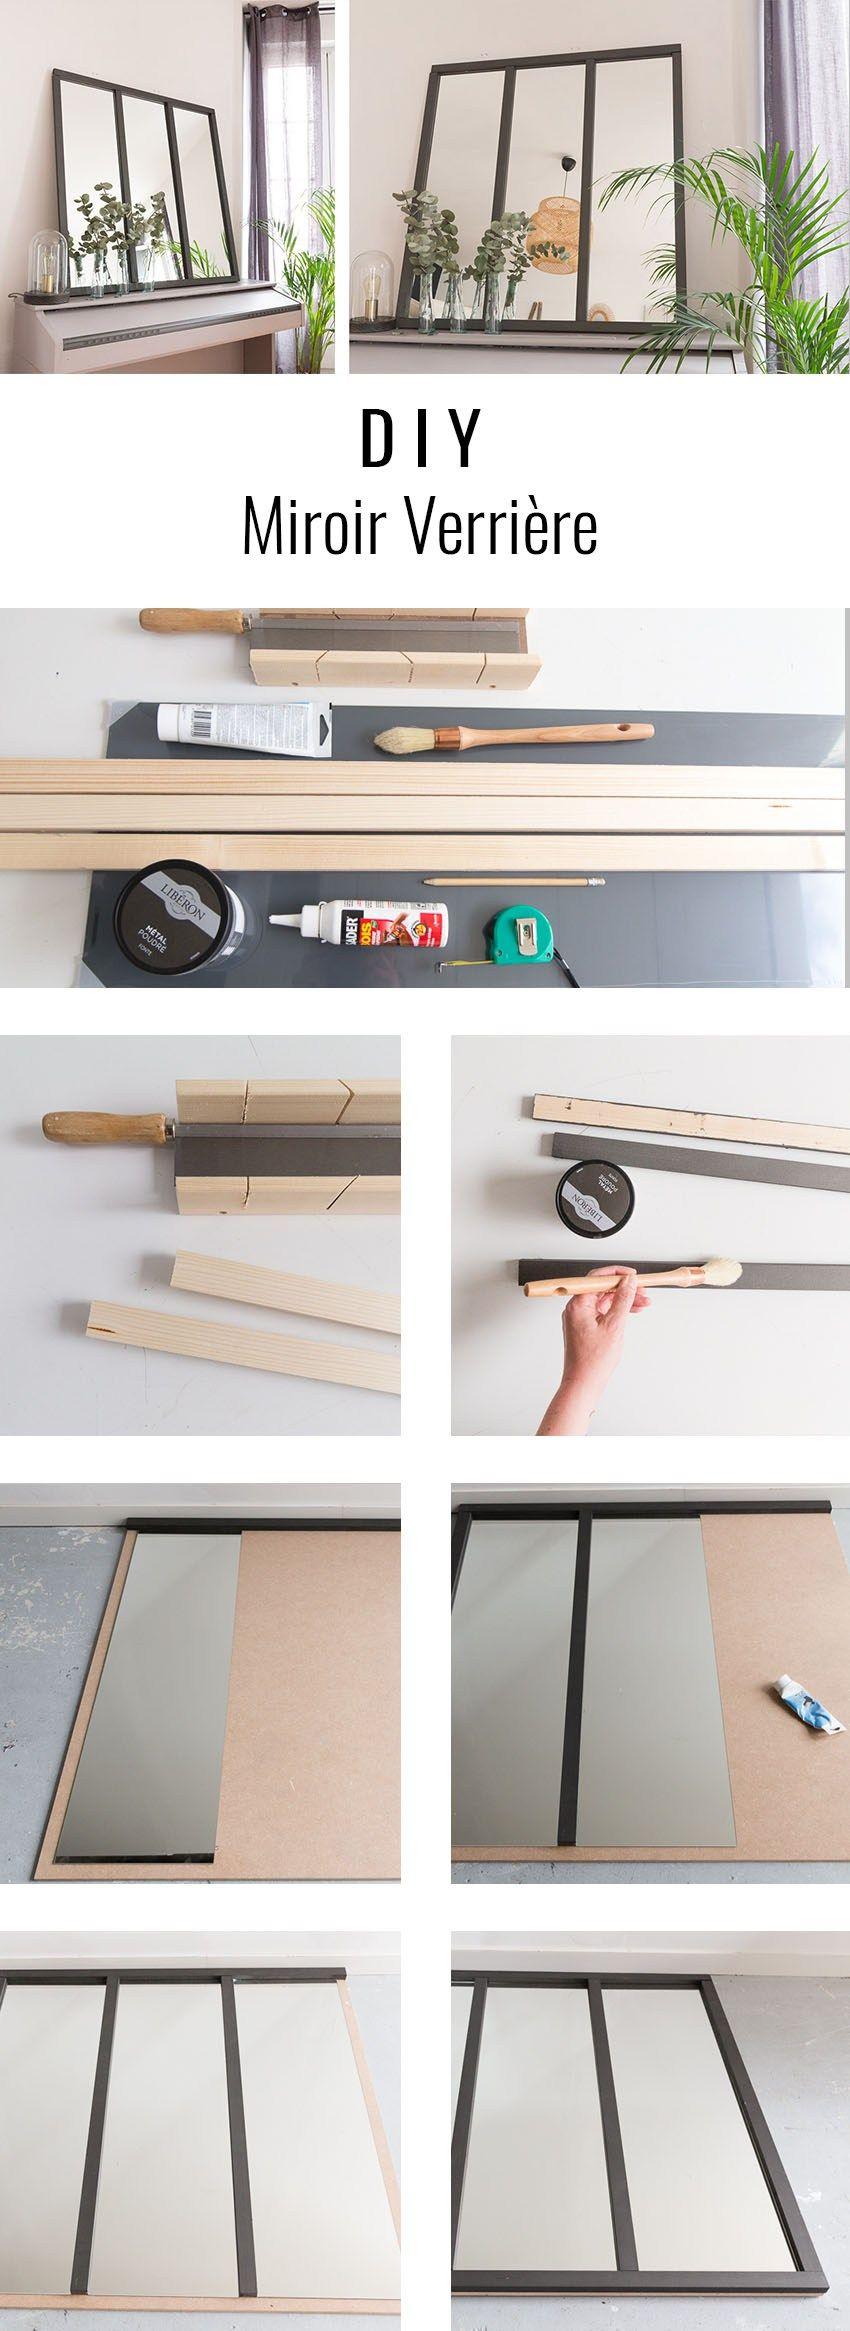 diy miroir verri re astuces deco pinterest. Black Bedroom Furniture Sets. Home Design Ideas